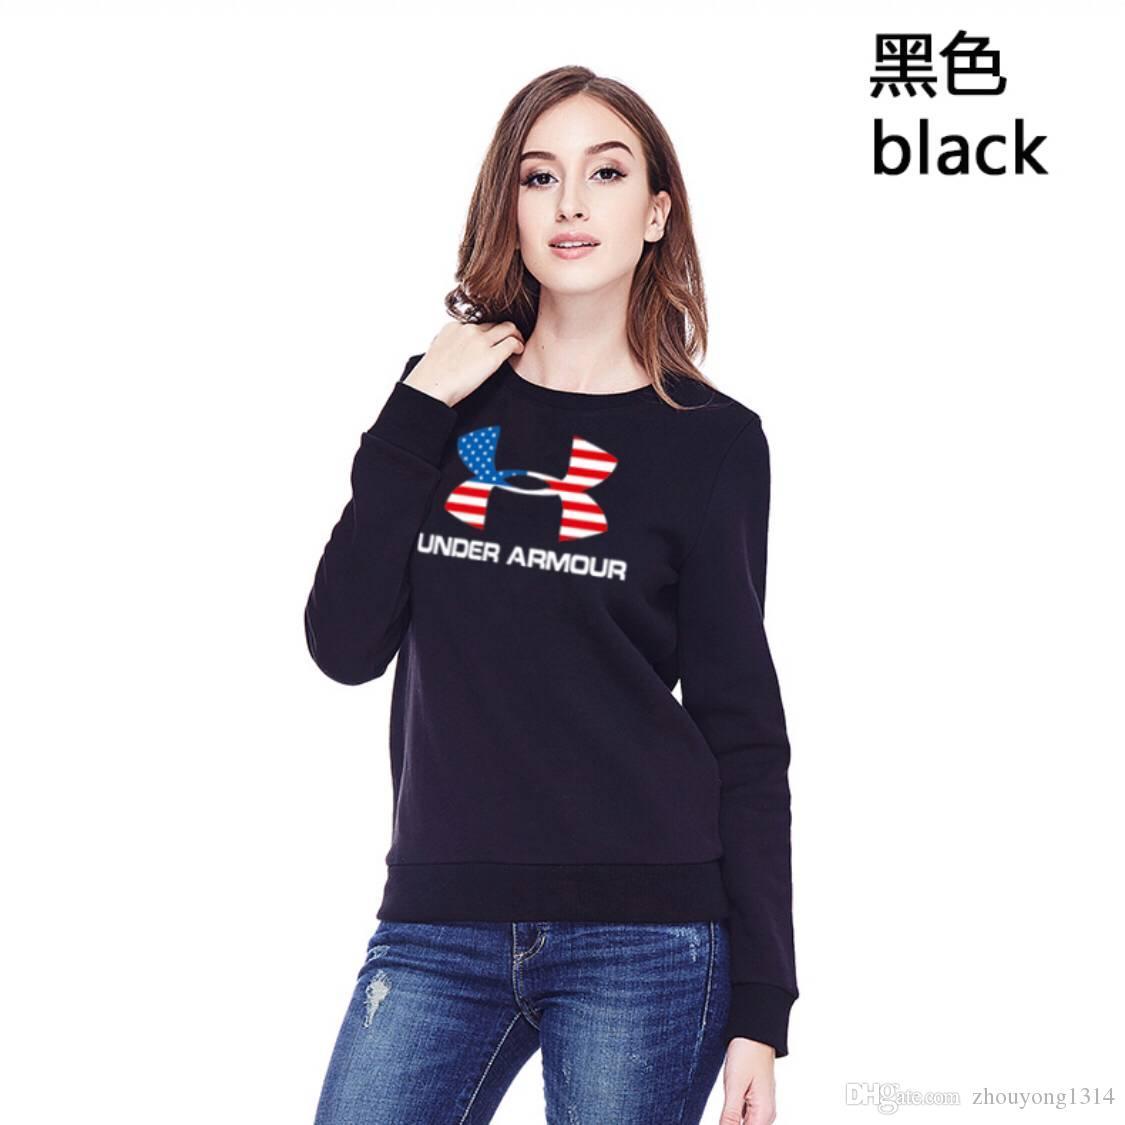 d1cee253616 Compre Producto De Diseño Superior Descuento Promoción 100% Algodón Mujer  Manga Larga Chaleco A $18.1 Del Zhouyong1314 | DHgate.Com